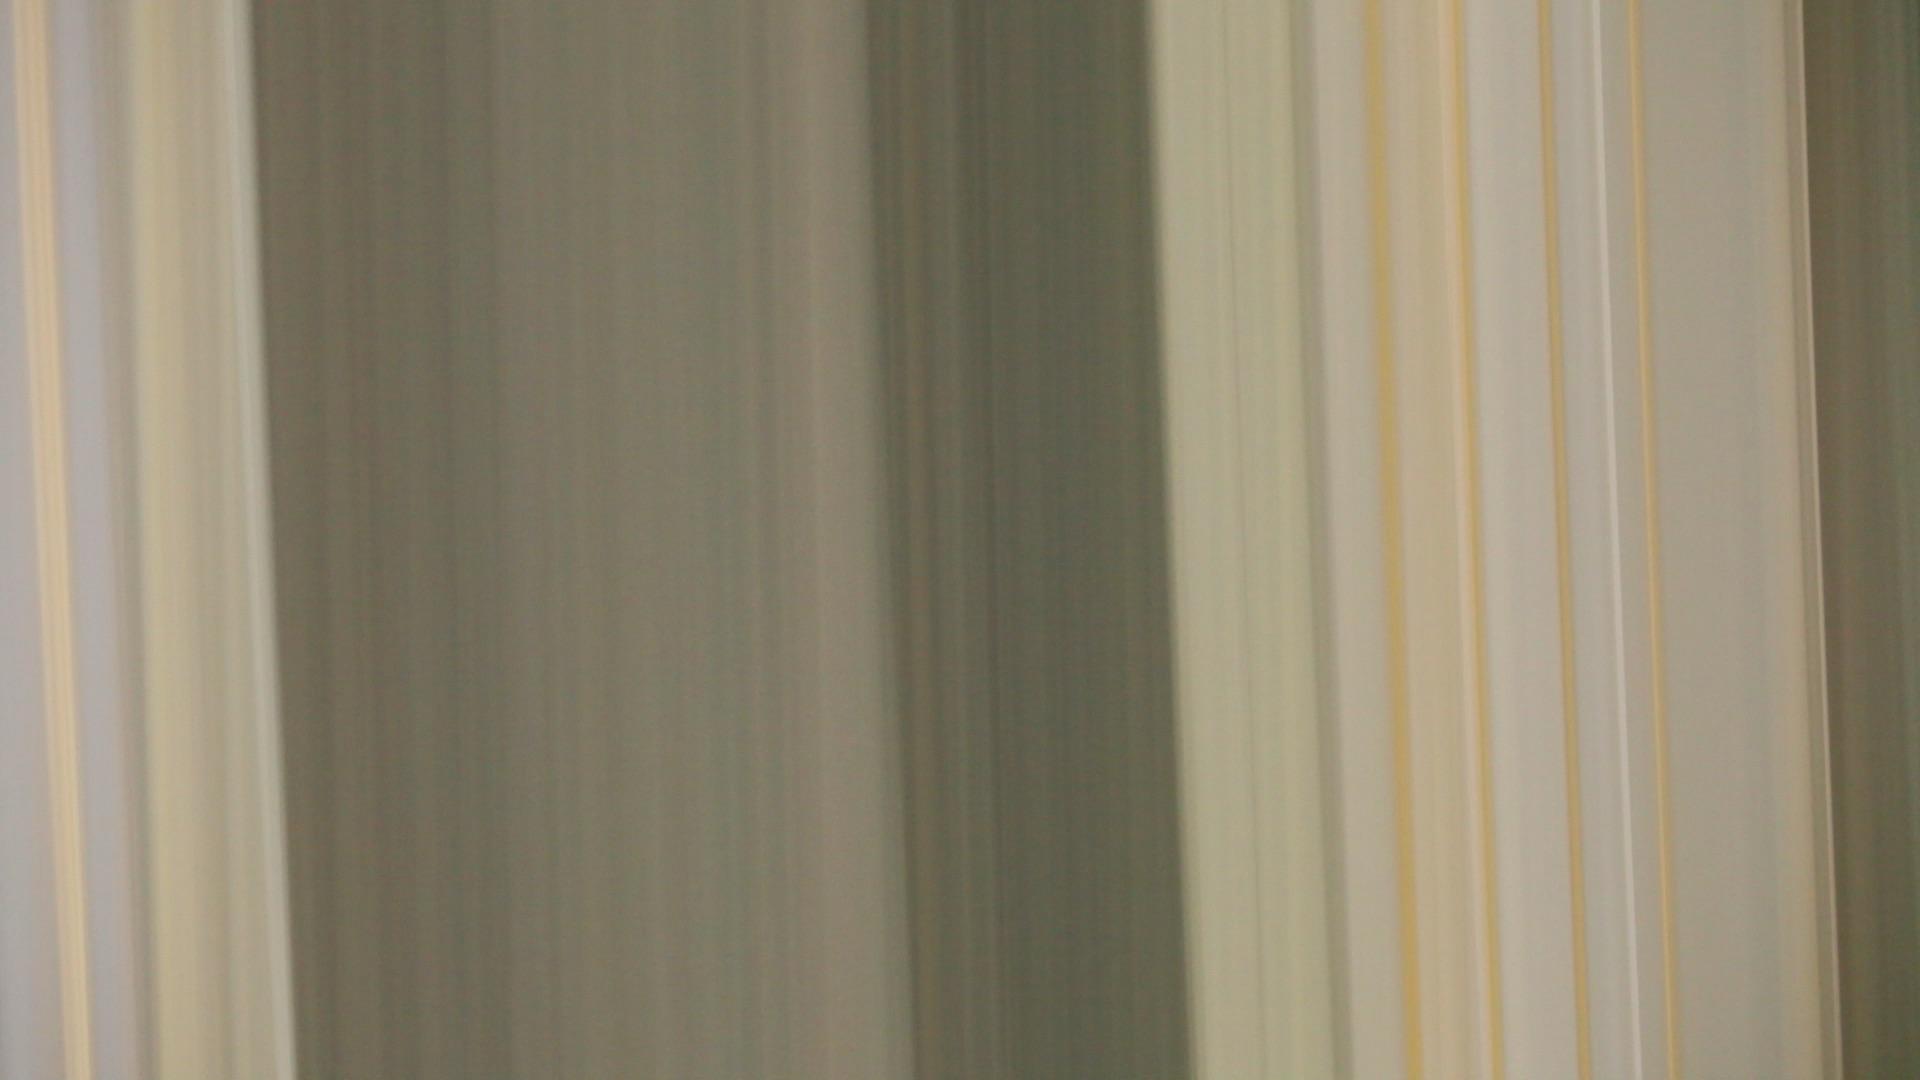 istanbulof1_0065_Layer 86.jpg